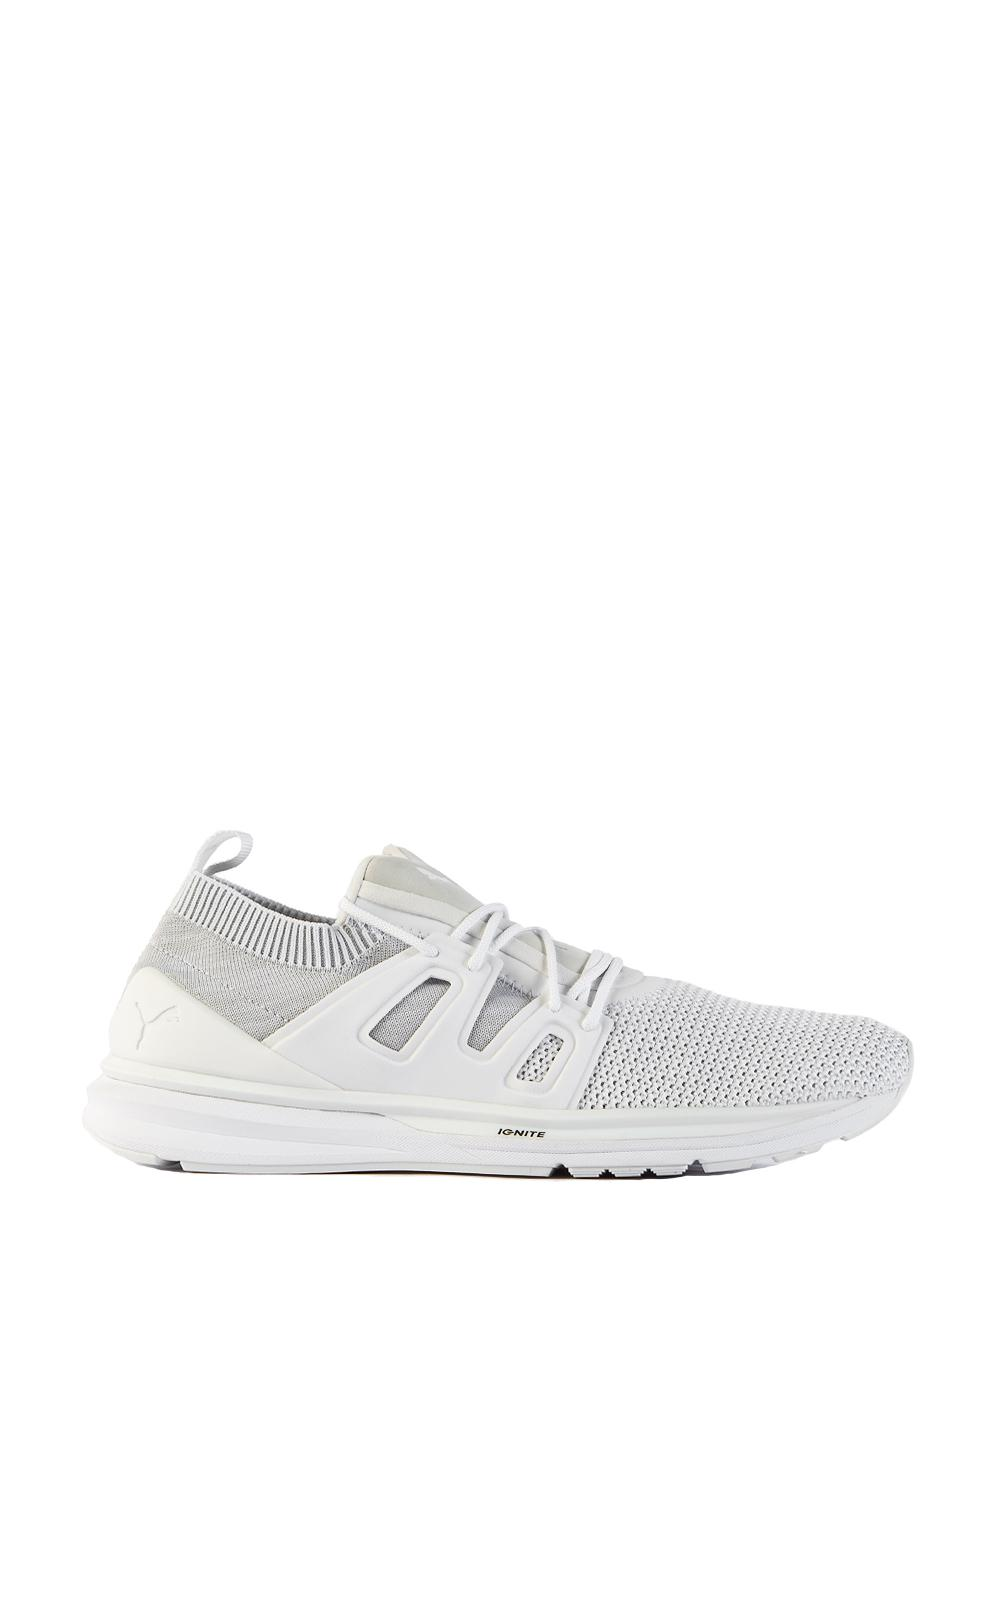 Puma B.o.g Limitless Lo Evoknit S White in White - Lyst 202b2b9a6